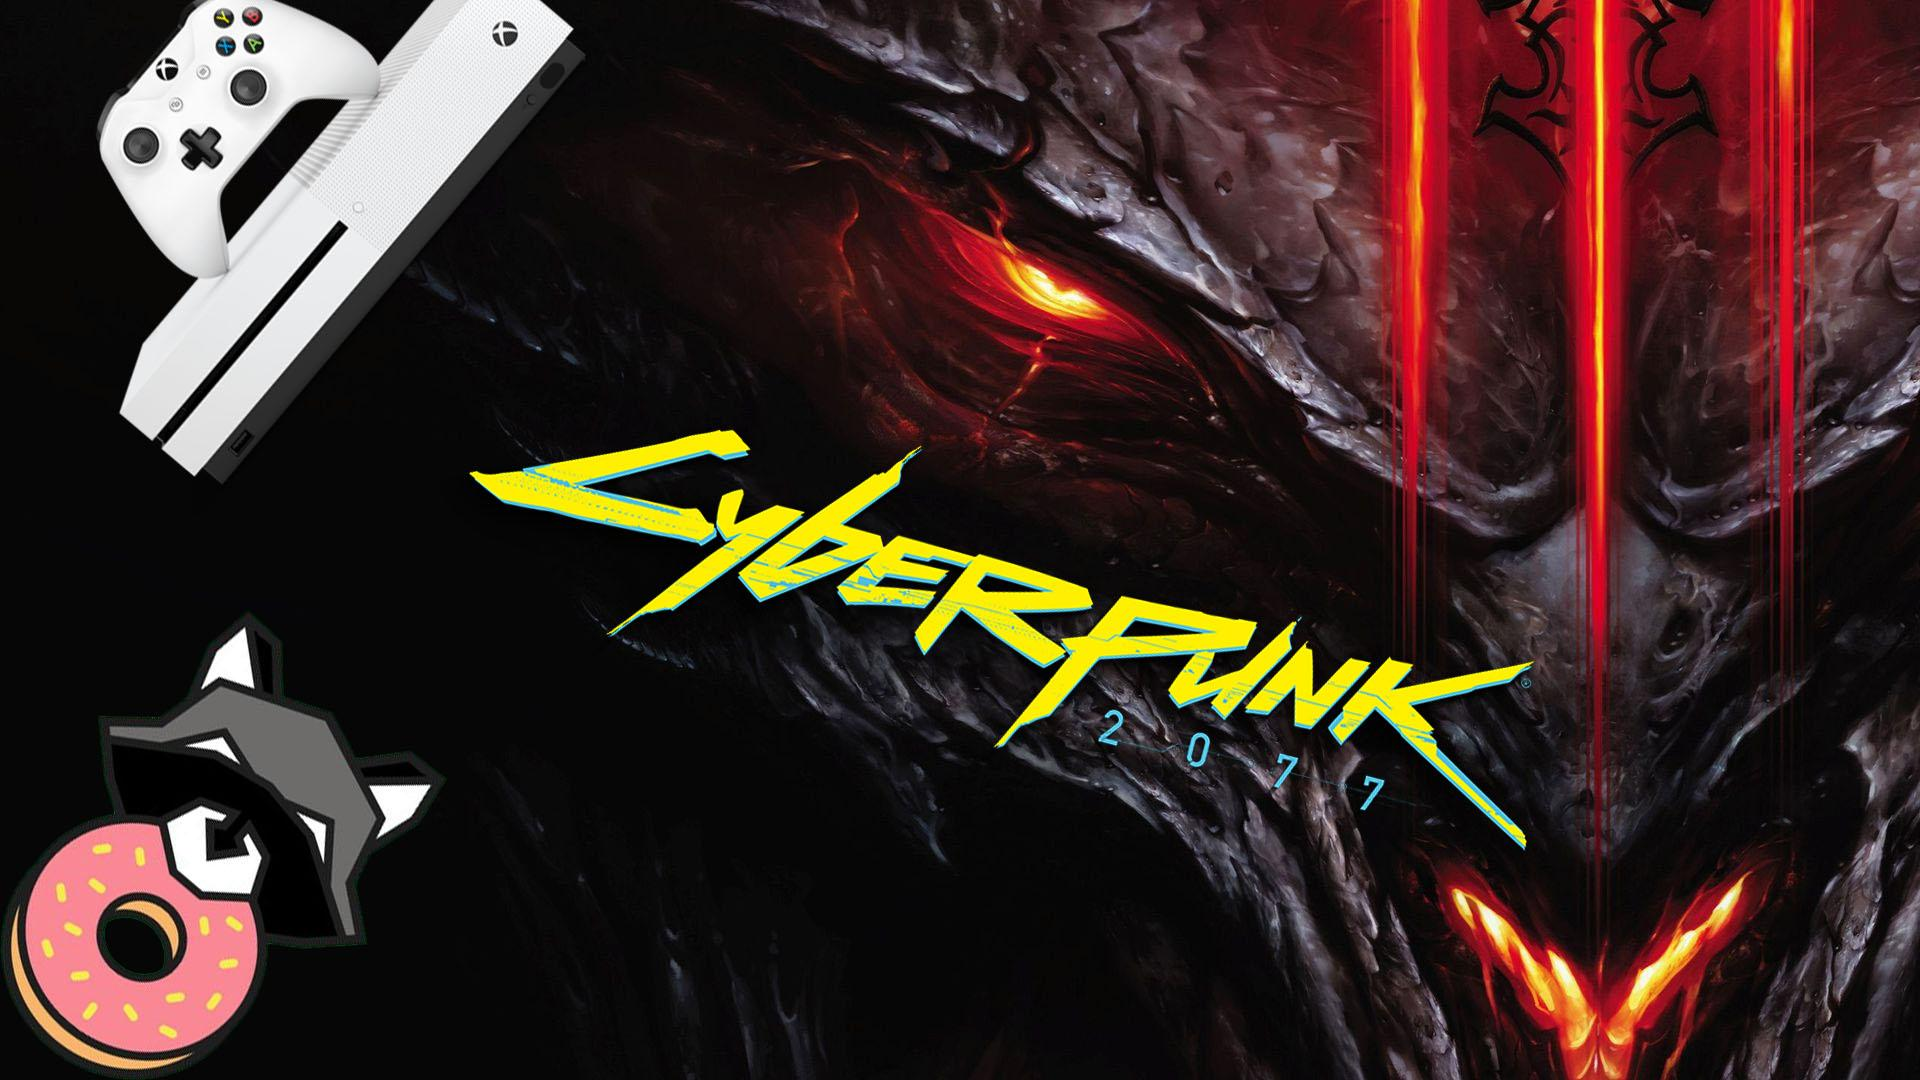 GtW: Cyberpunk Eyes, Diablo III on Netflix, Disney Streaming, and More!